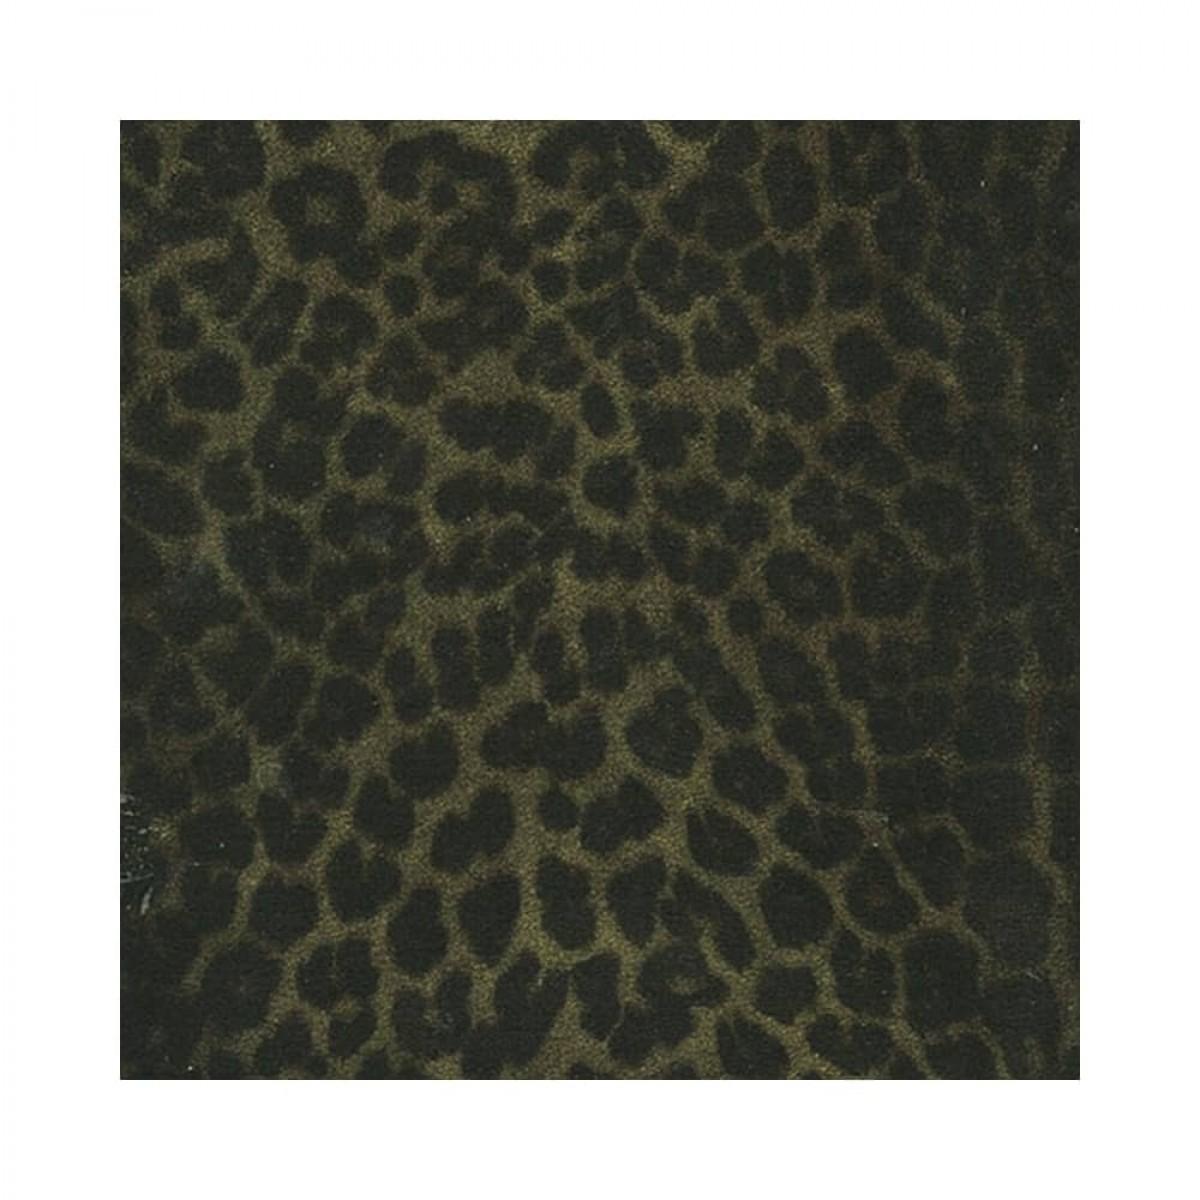 jerome dryfuss henri pung - leopard kaki - farve